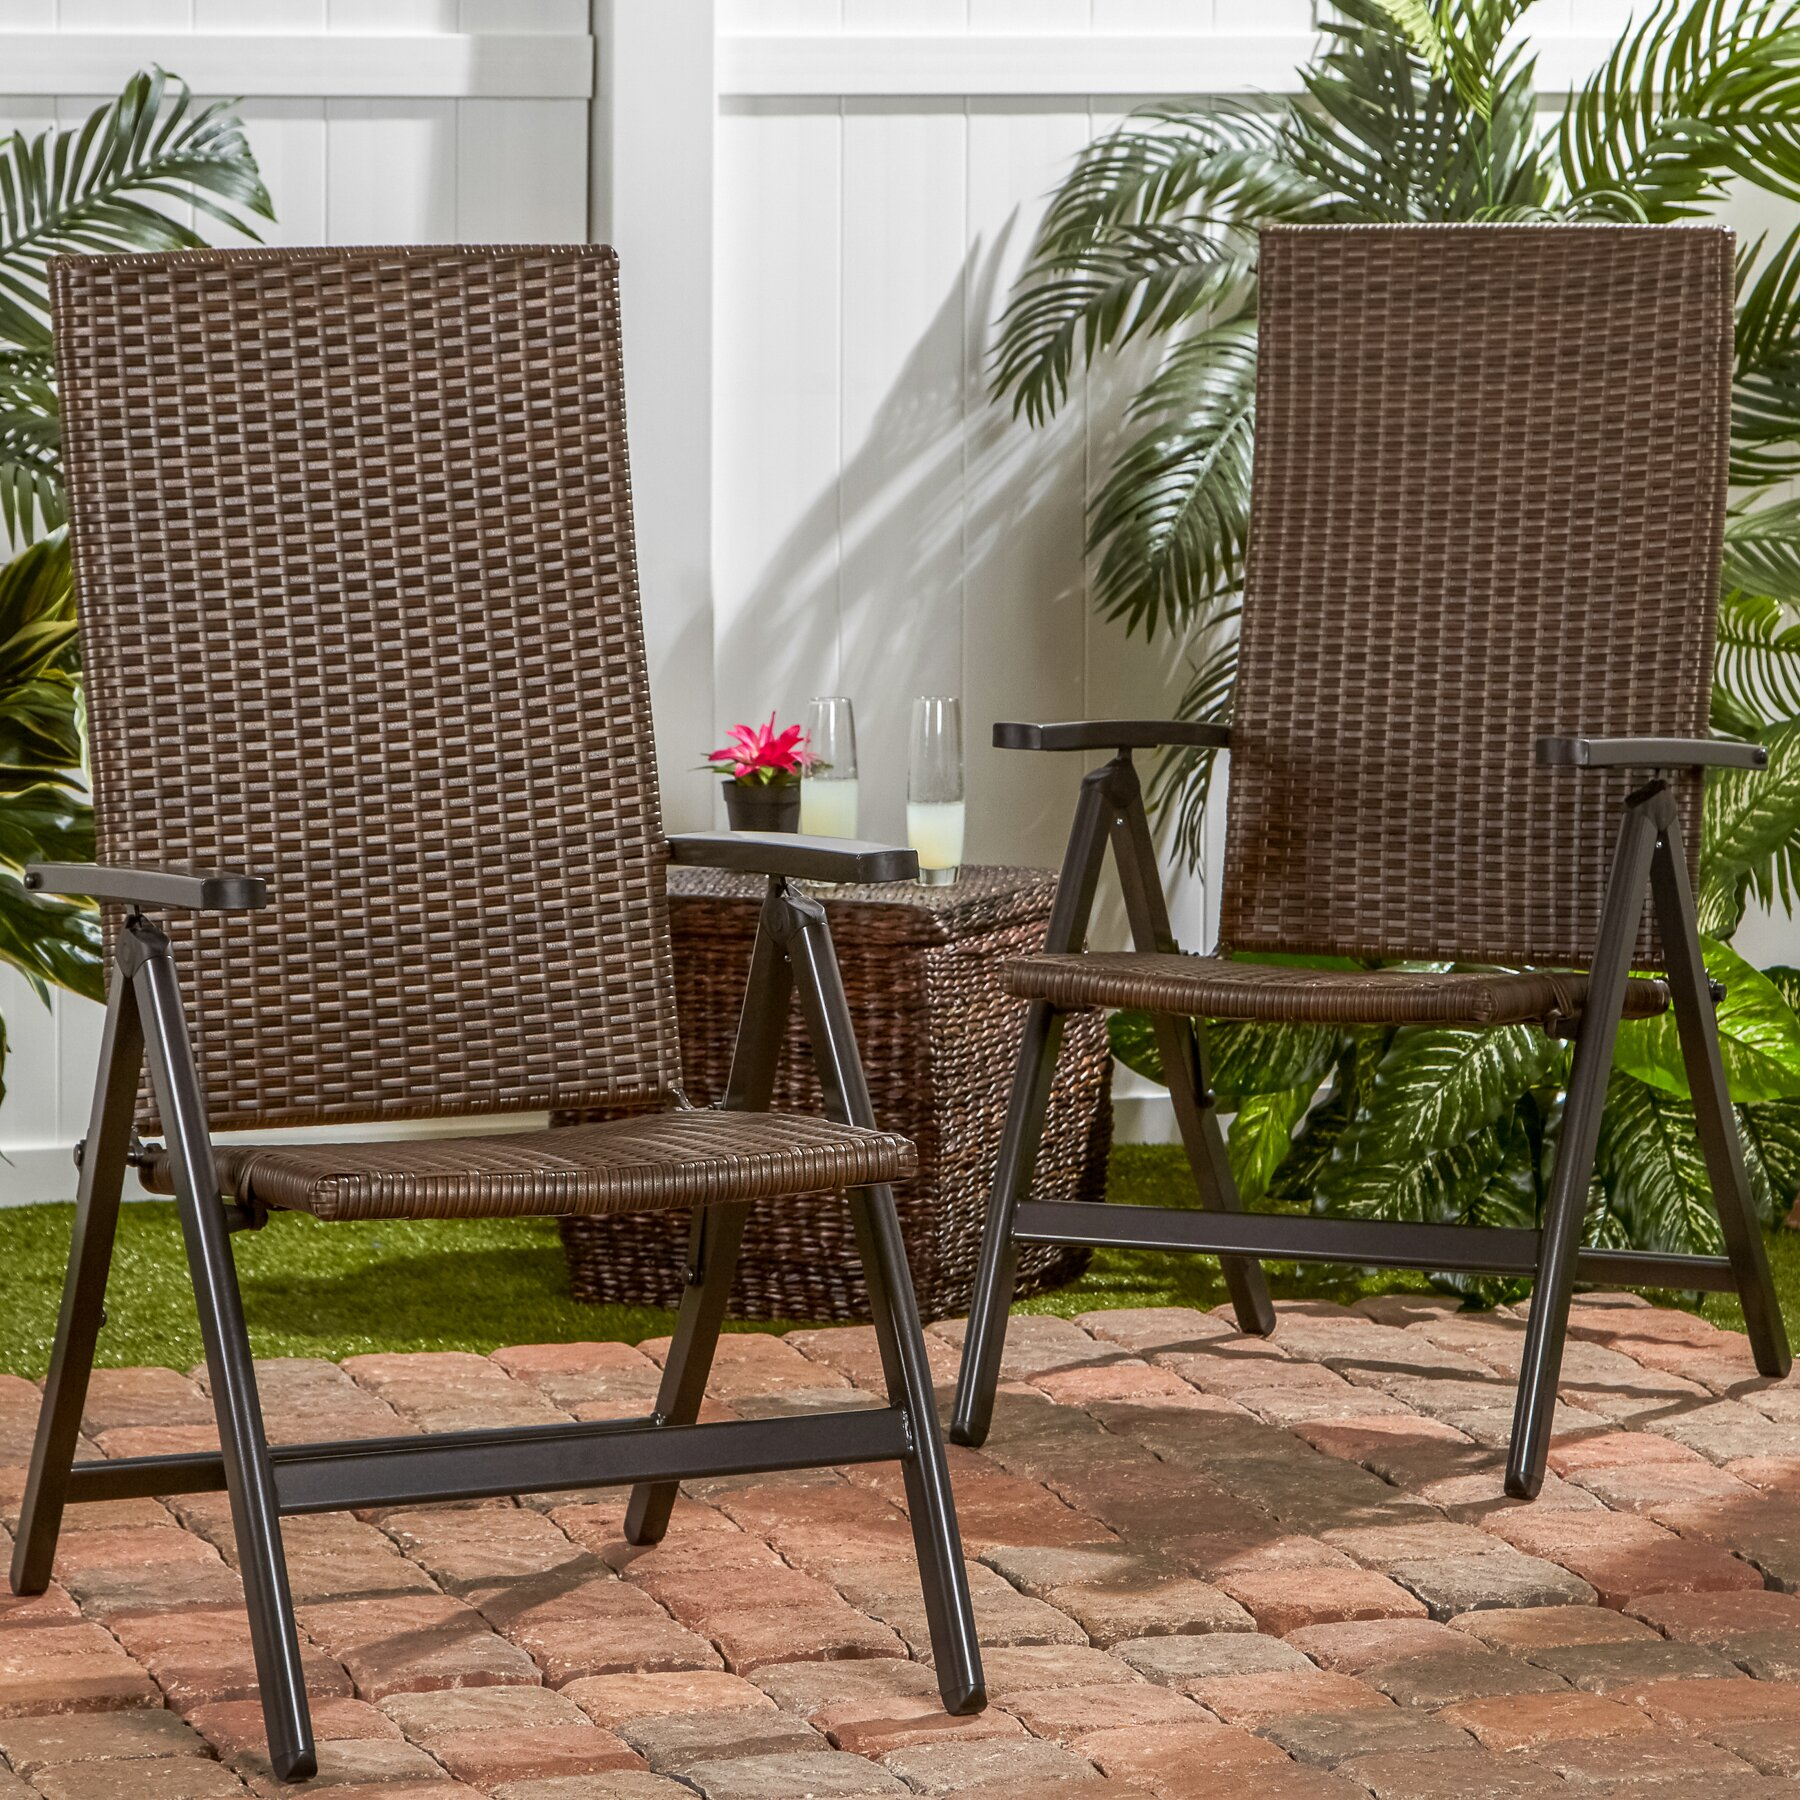 Greendale Home Fashions Wicker Outdoor Reclining Zero